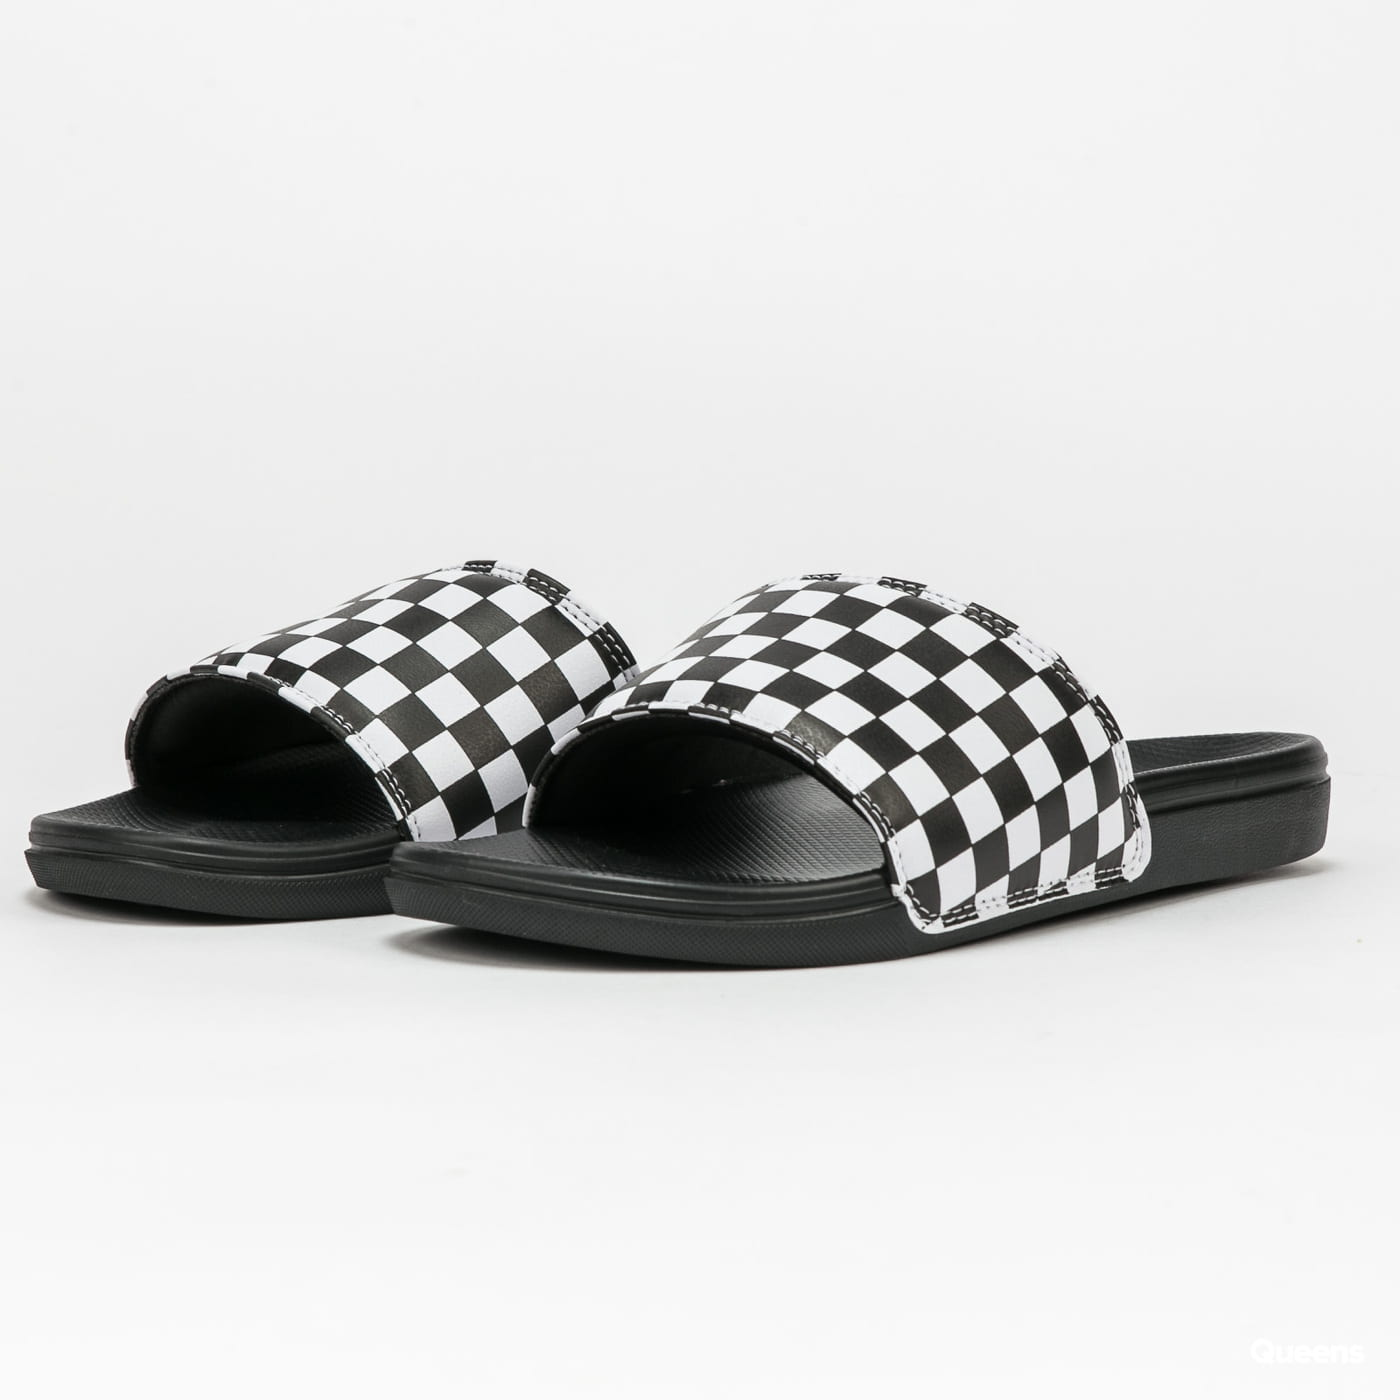 Vans MN La Costa Slide-On (checkerboard)truwht / blk